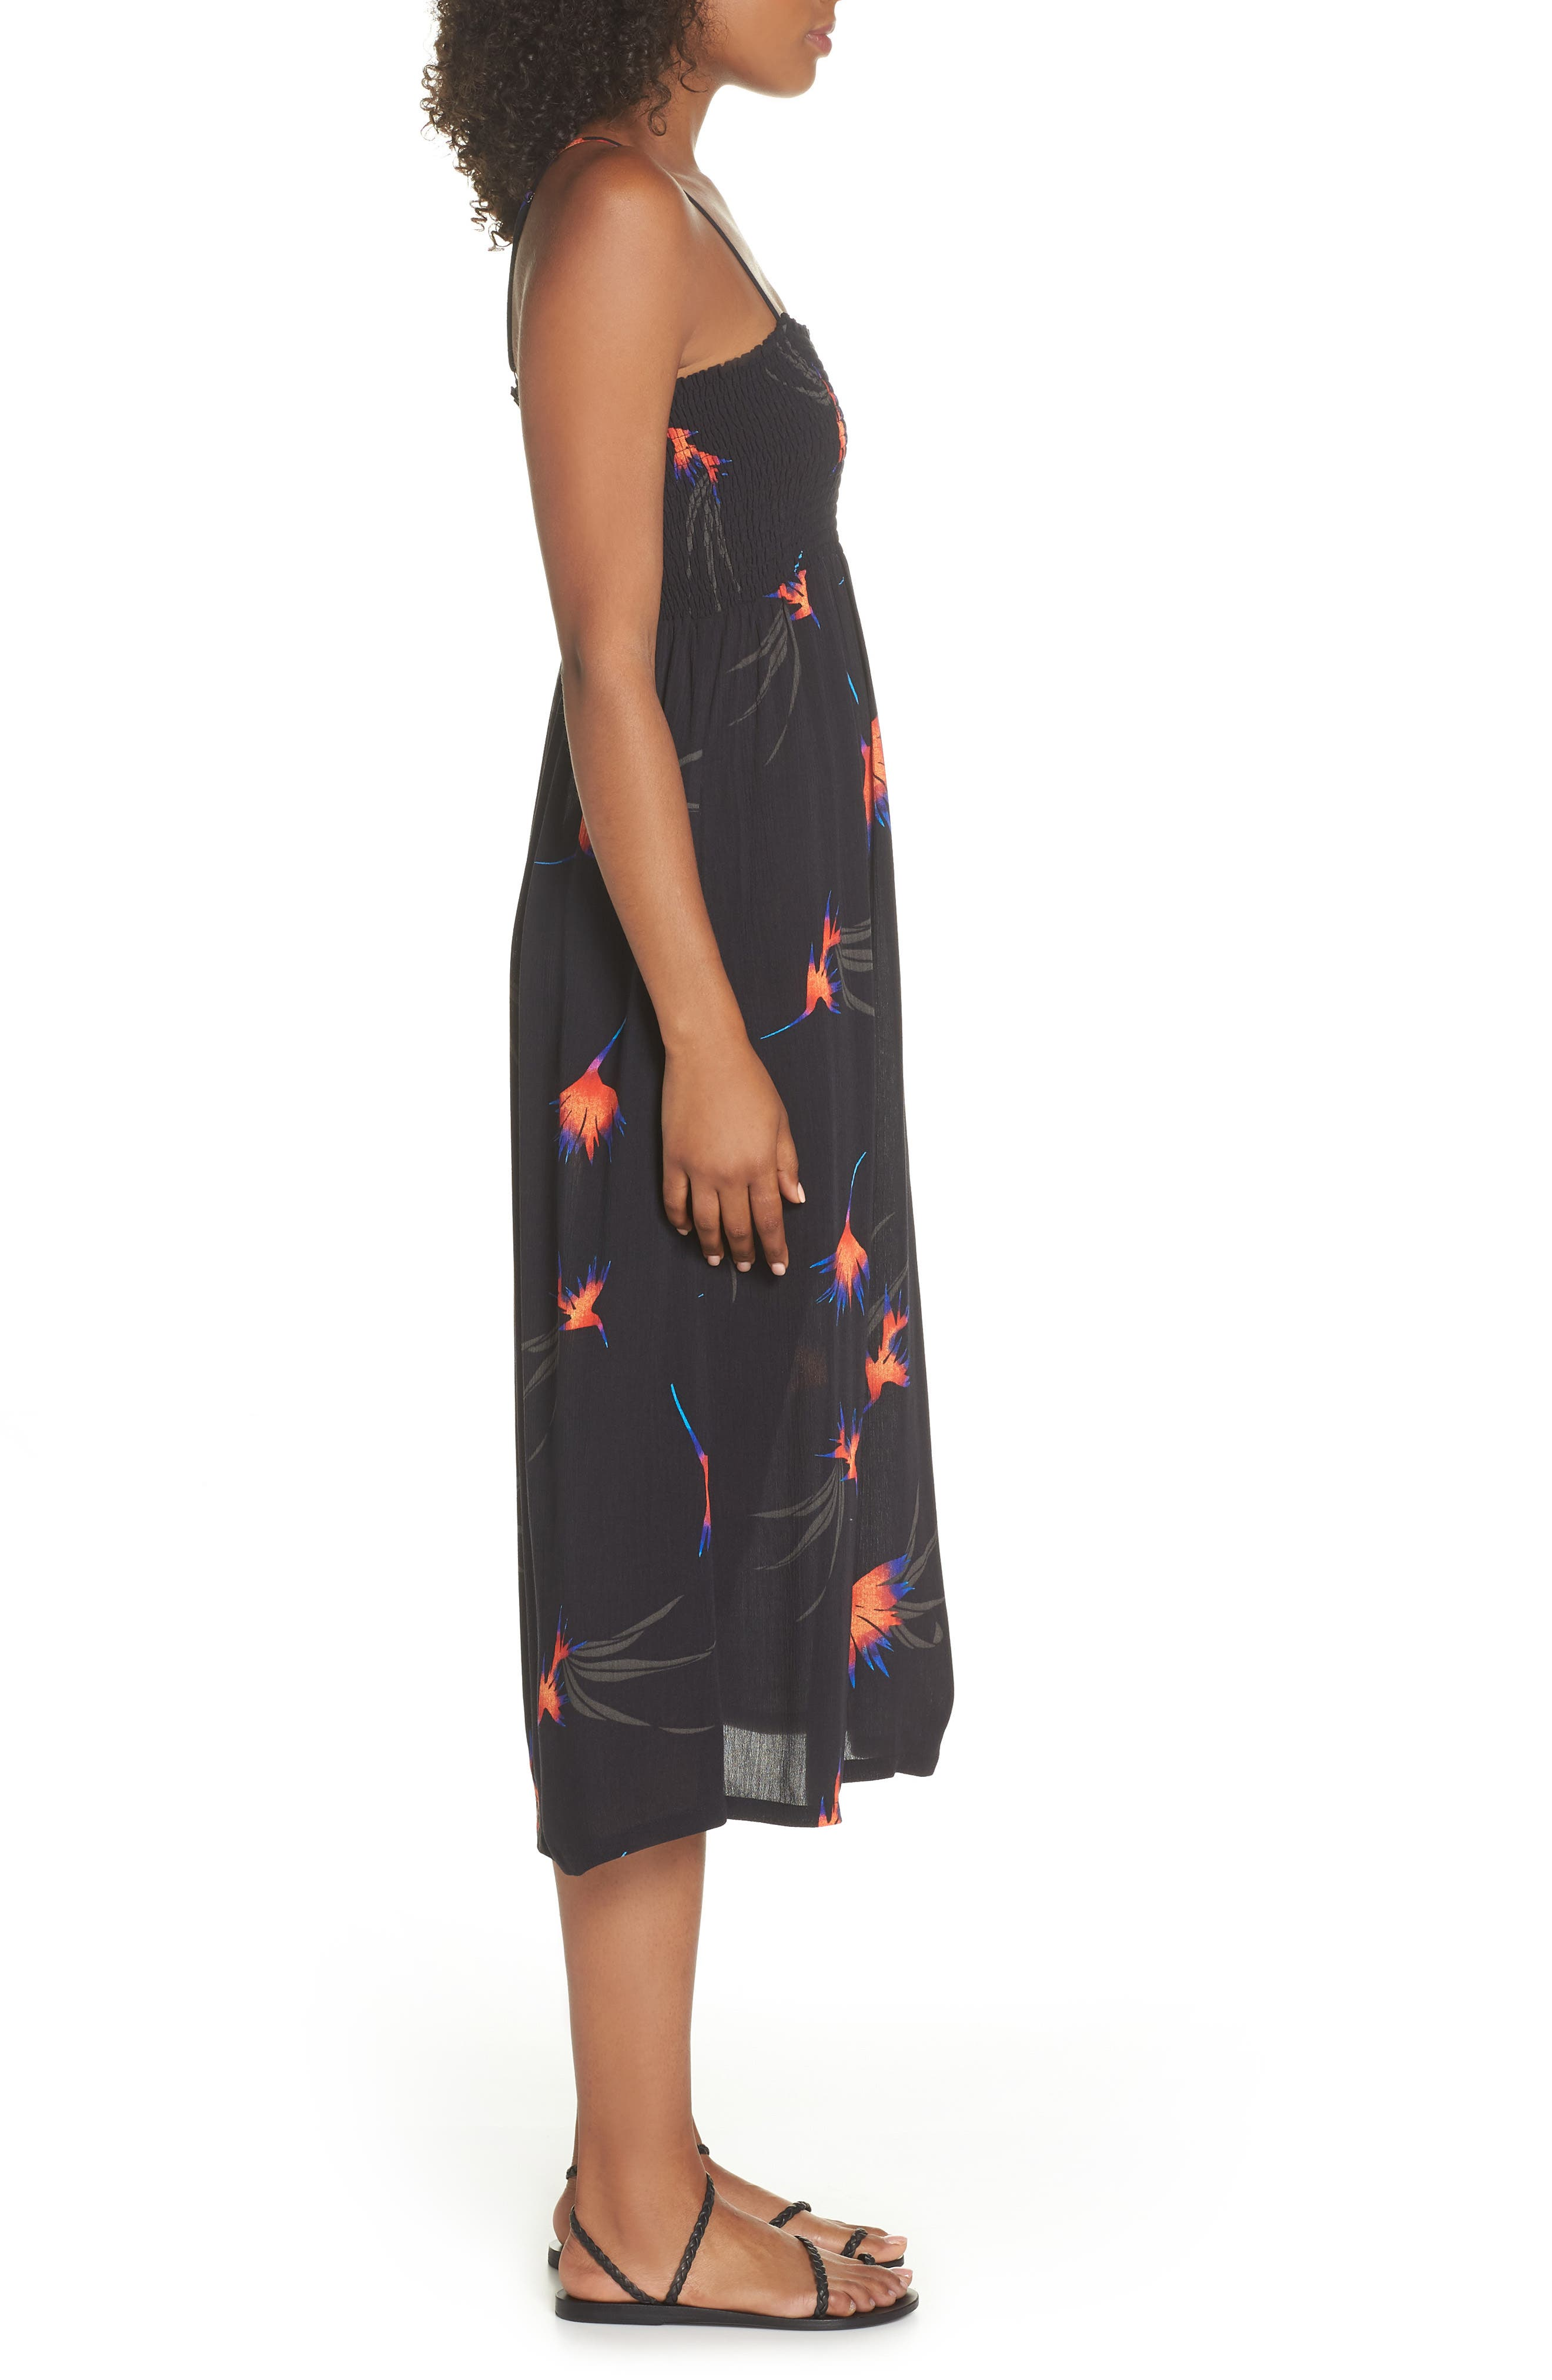 Sydney Midi Dress,                             Alternate thumbnail 3, color,                             Black Paradise City Print